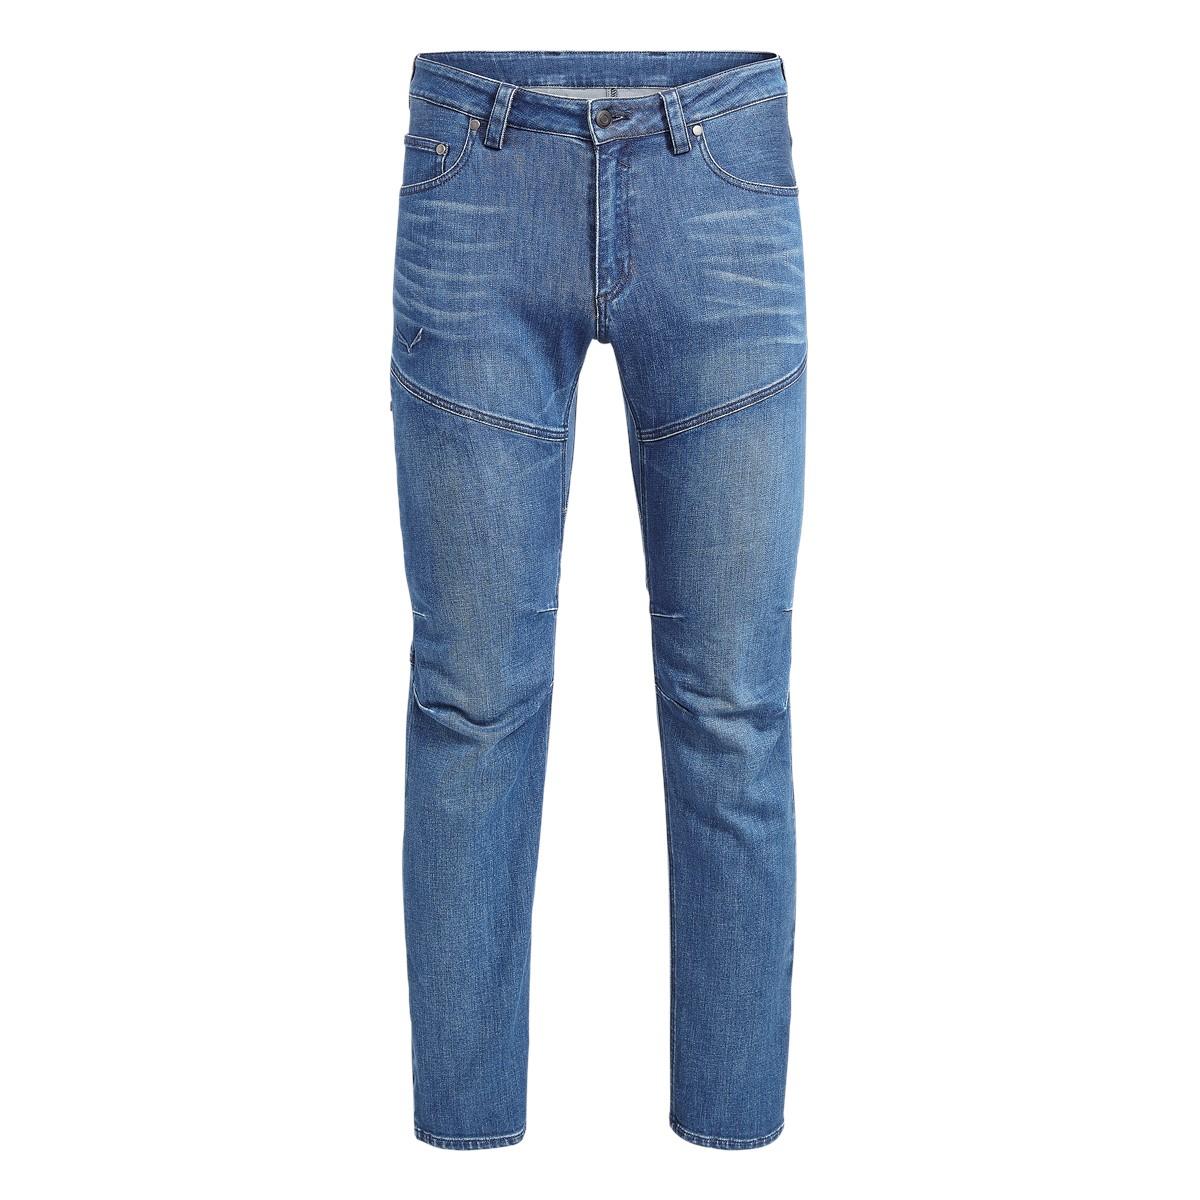 Salewa AGNER DENIM CO M PNT-jeans blue-48/M - Gr. 48/M